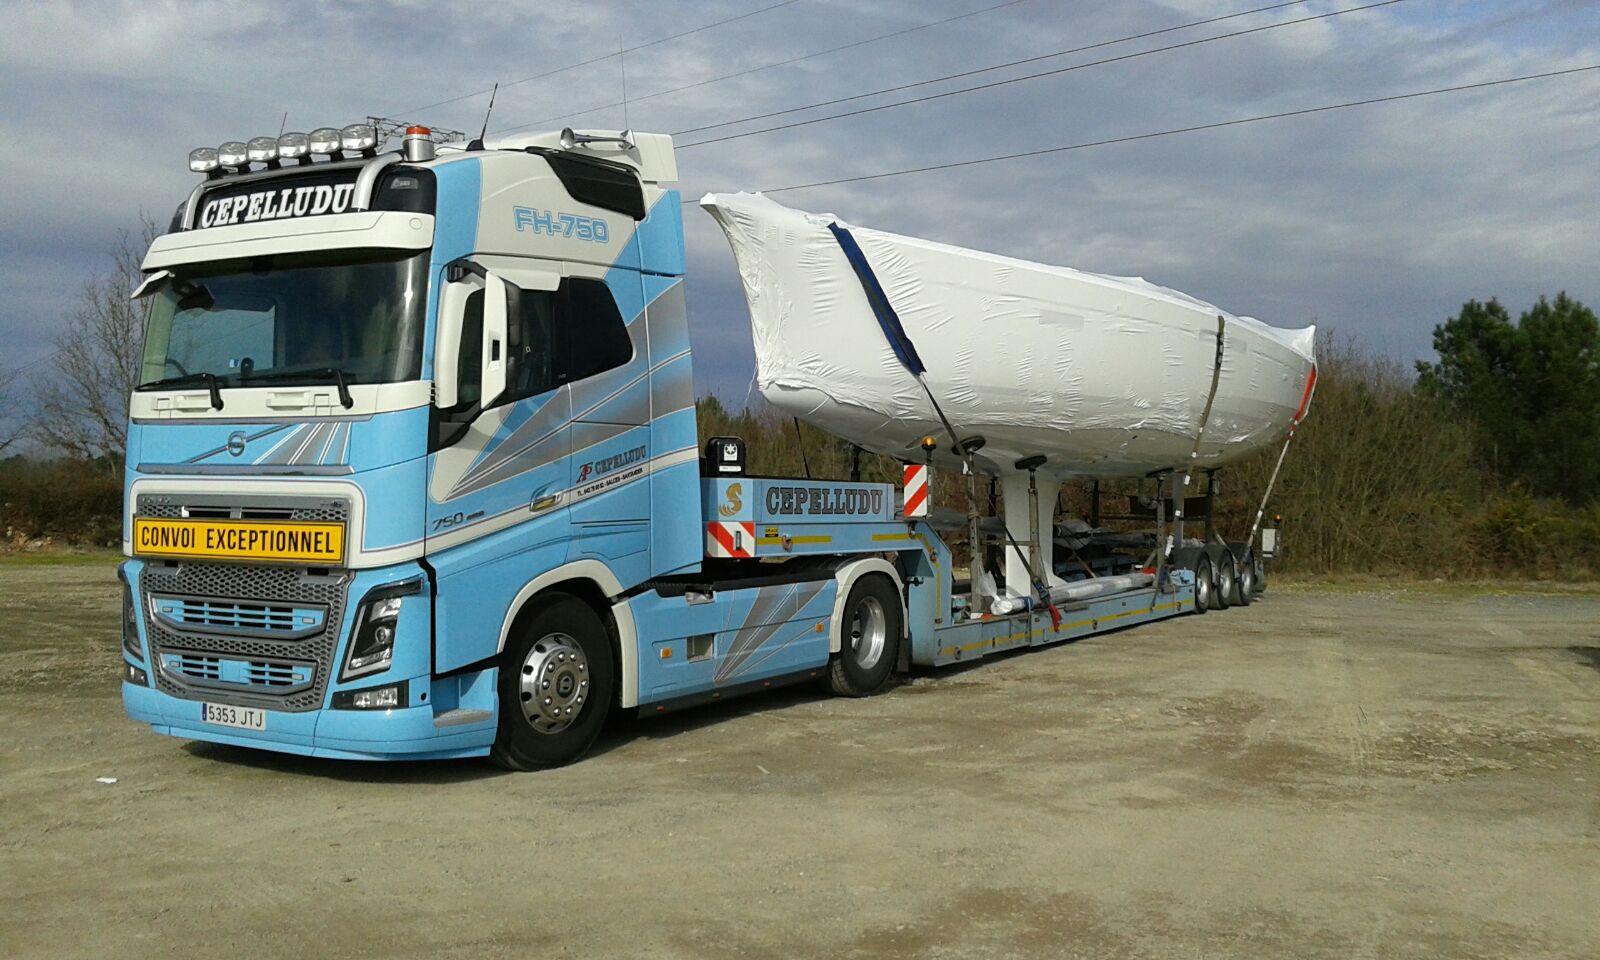 Cepelludo-Transporte-Embarcaciones03